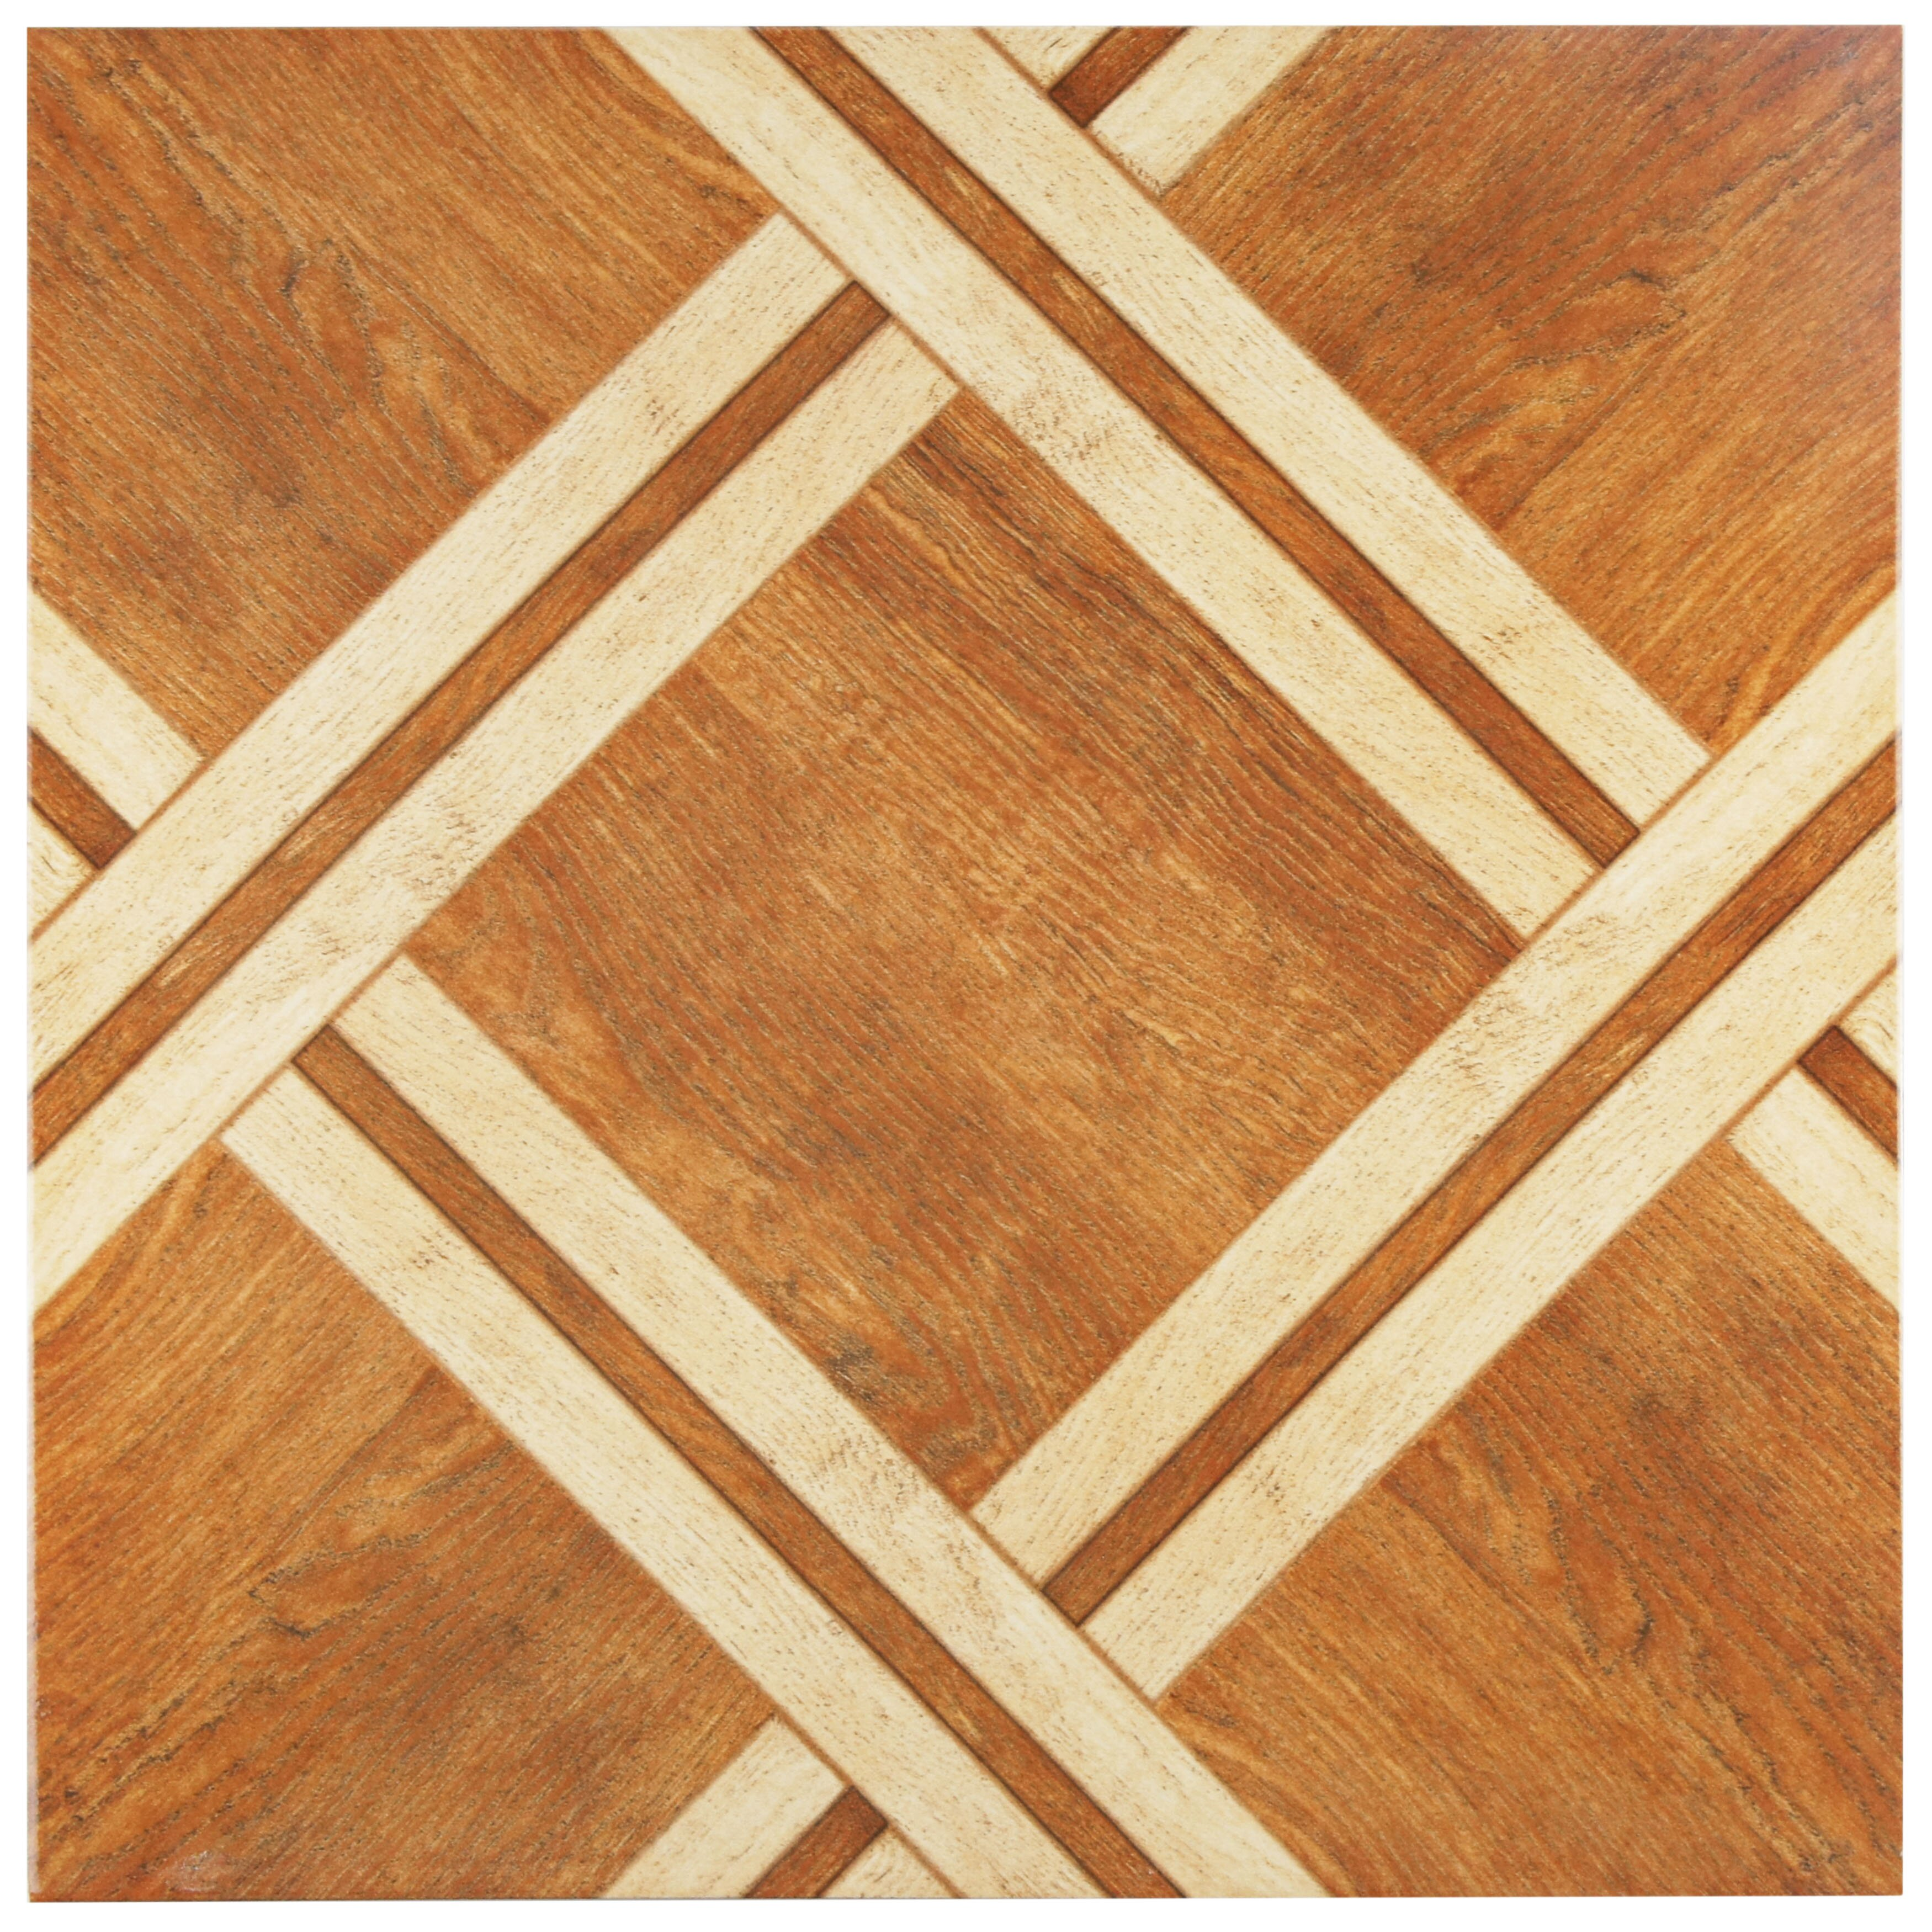 elitetile anchorage x ceramic wood look tile in caramelo reviews wayfair. Black Bedroom Furniture Sets. Home Design Ideas